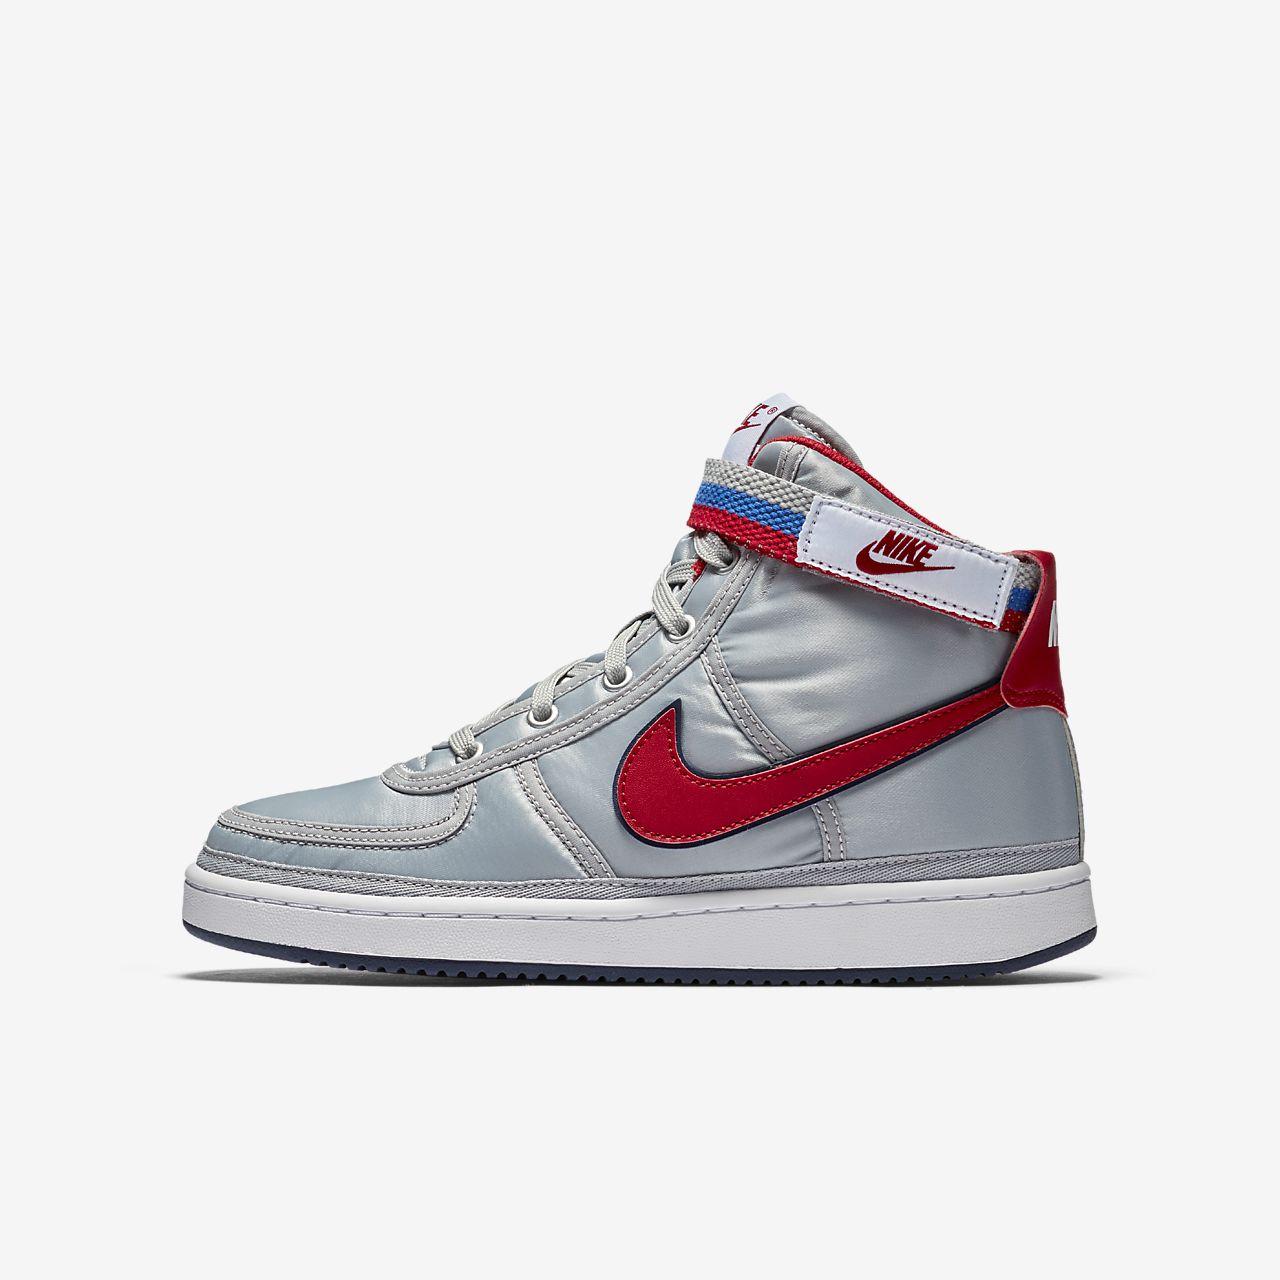 Nike Vandal High Supreme Men's Lifestyle Shoes White qS9072B